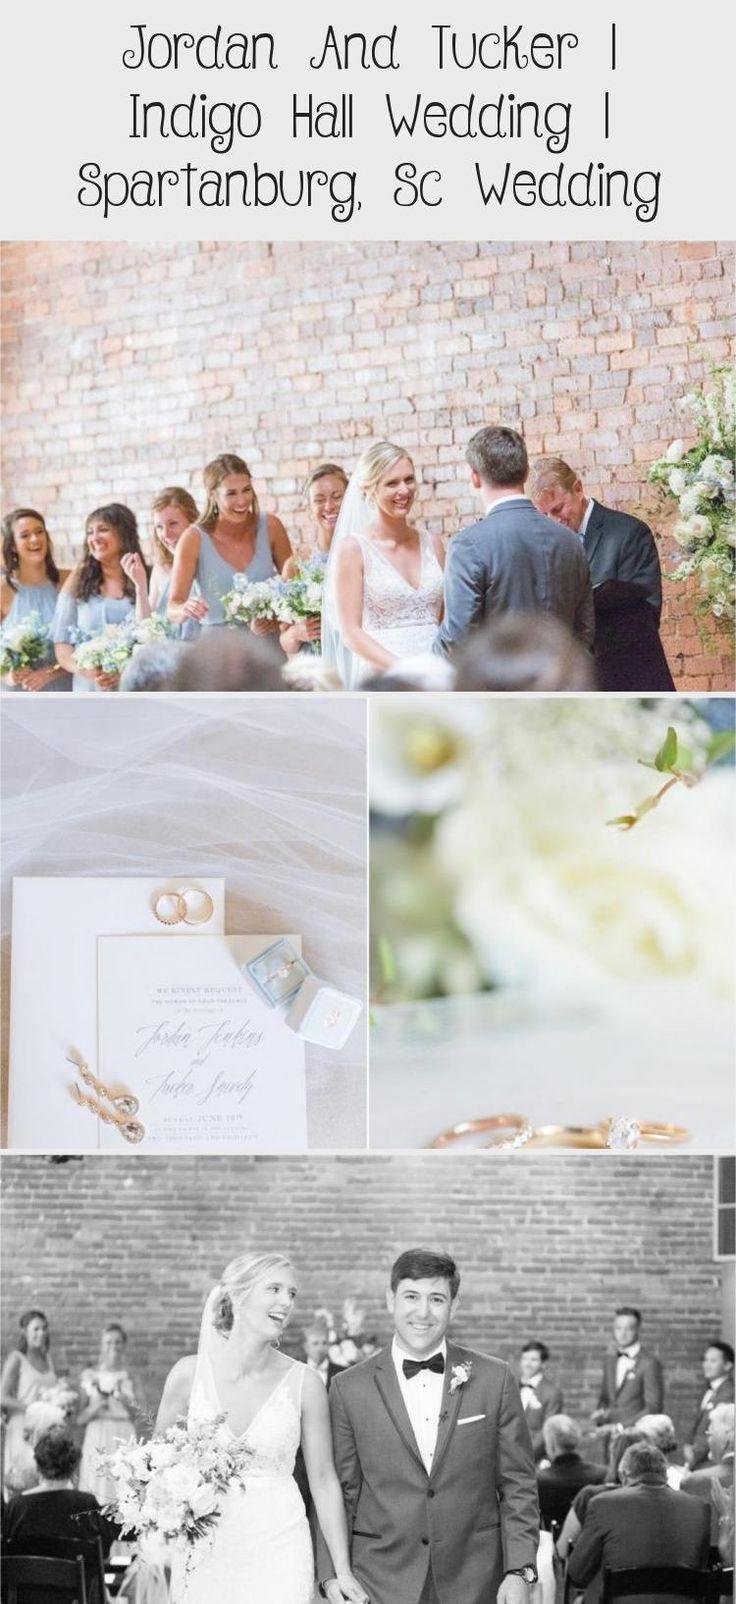 Indigo Hall Spartanburg Wedding   Greenville, SC Wedding Photographer   Christa Rene Photography #BridesmaidDressesBoho #BridesmaidDresses2018 #BridesmaidDressesFall #VelvetBridesmaidDresses #BridesmaidDressesWinter